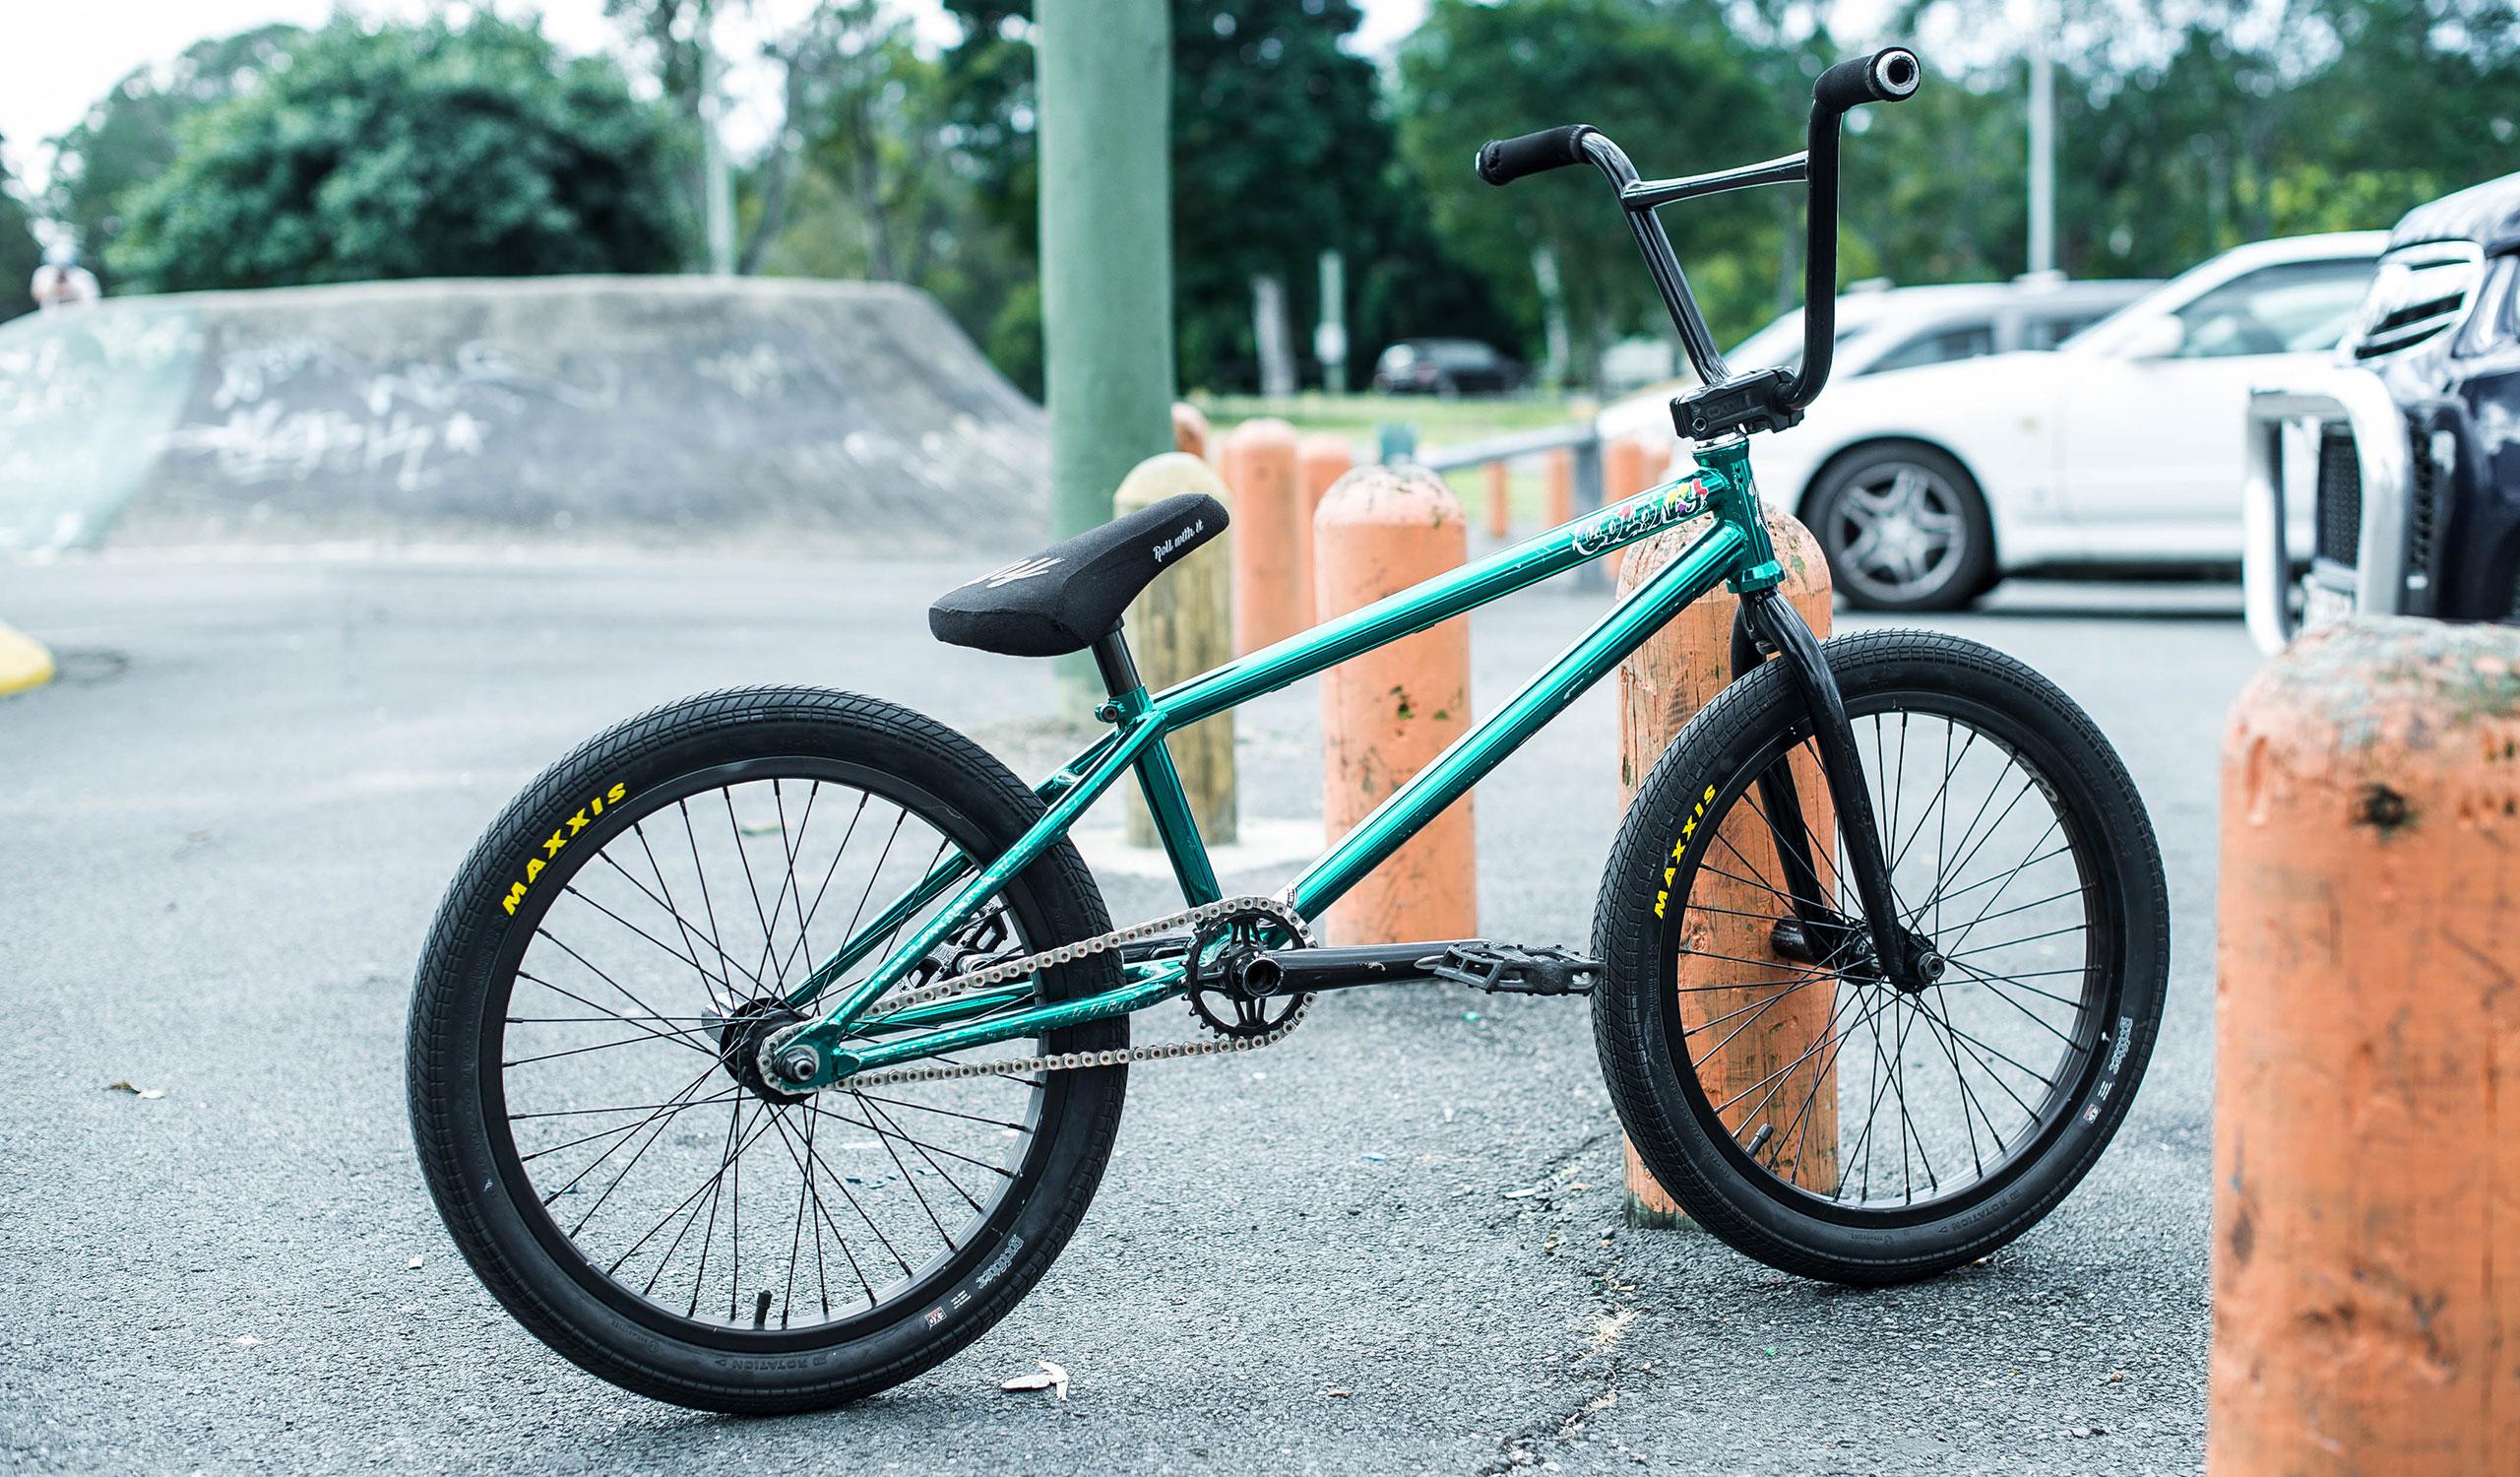 Josh Dove bike check